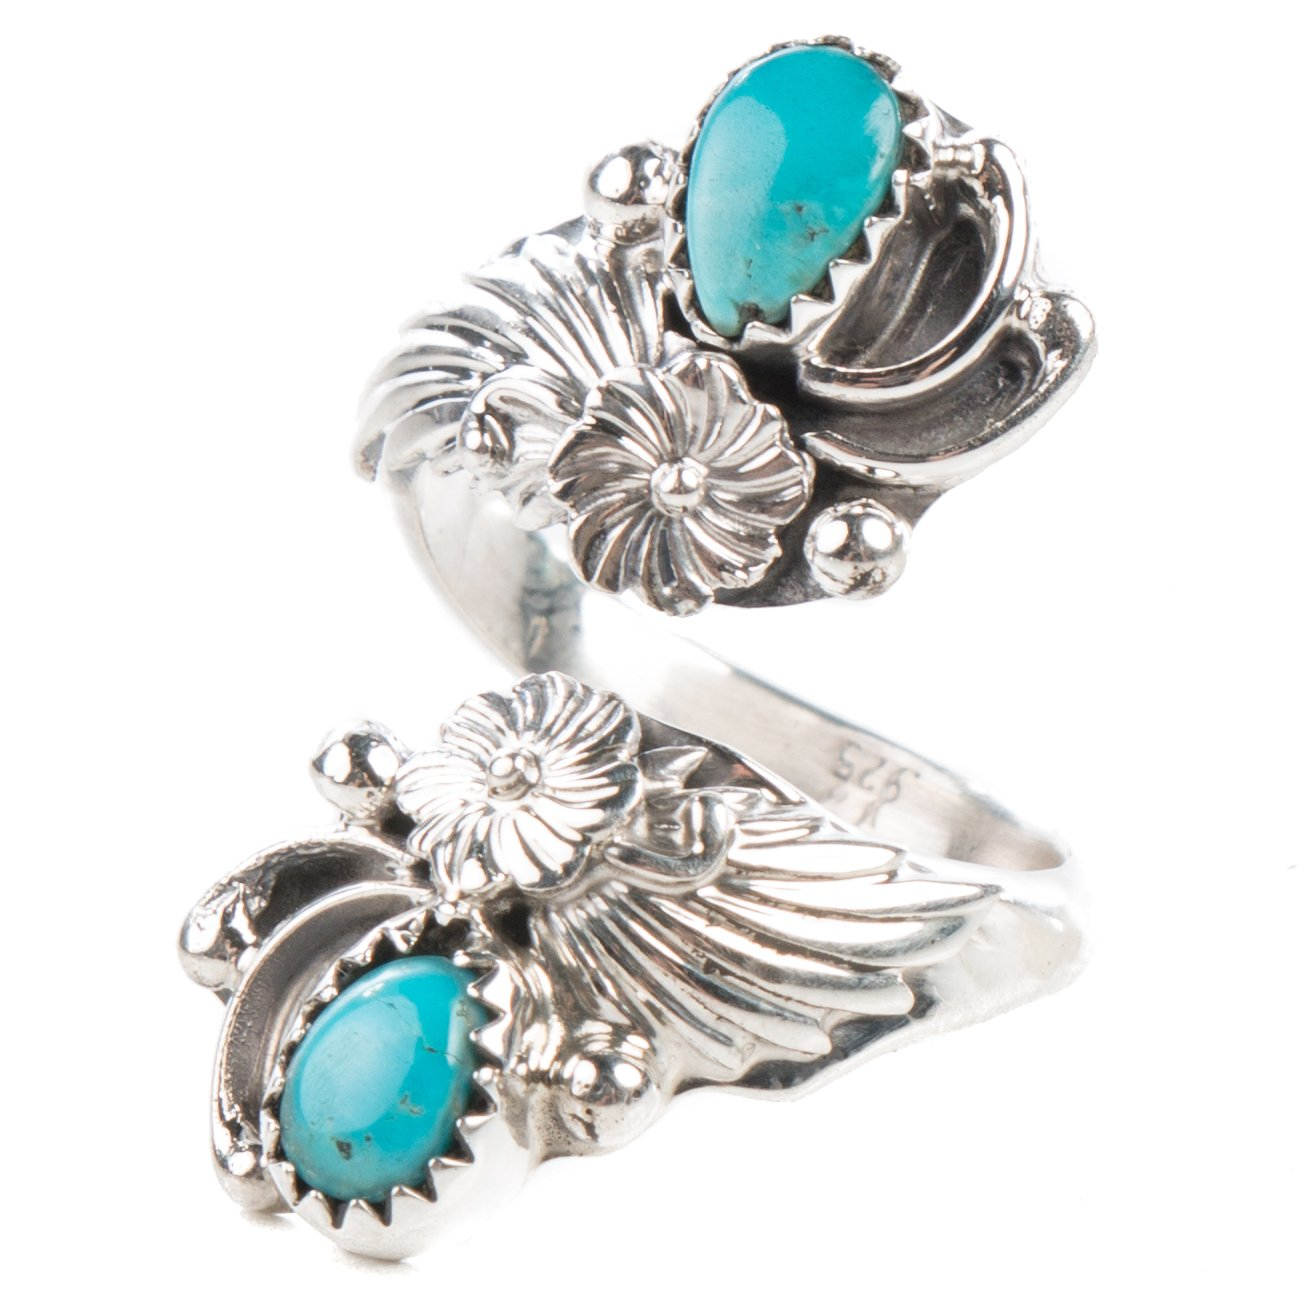 TSKIES Handmade Navajo Turquoise Sterling Silver Adjustable Ring by Native American Artist